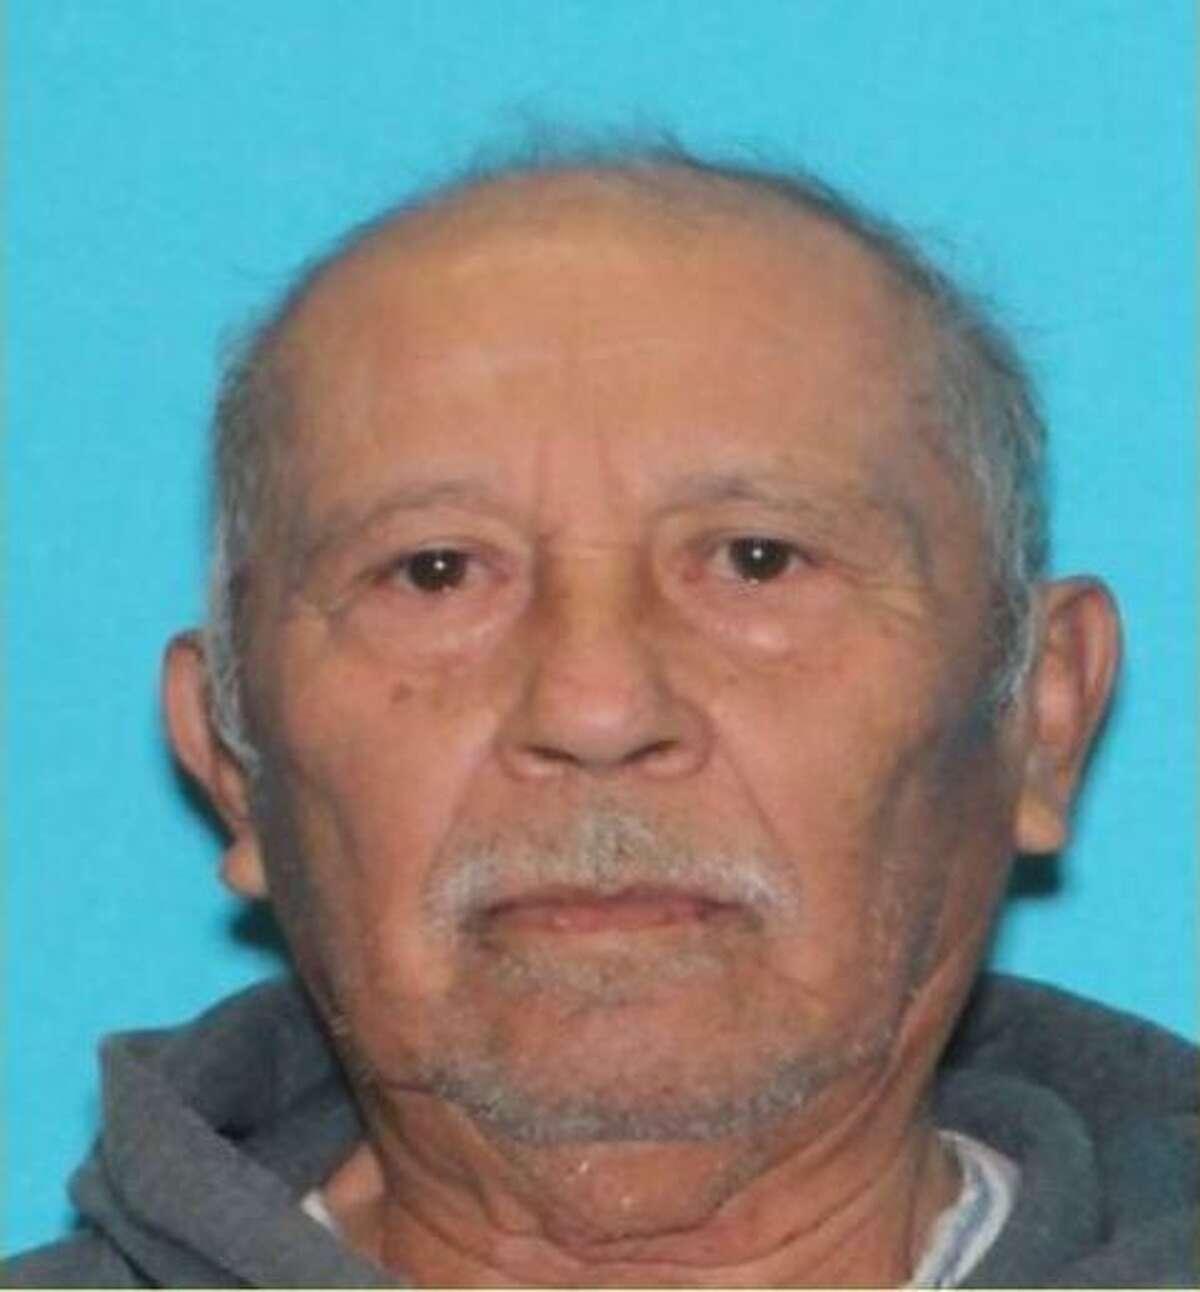 Mario Guevara Benitez, 77, was reported missing, Conroe authorities say.